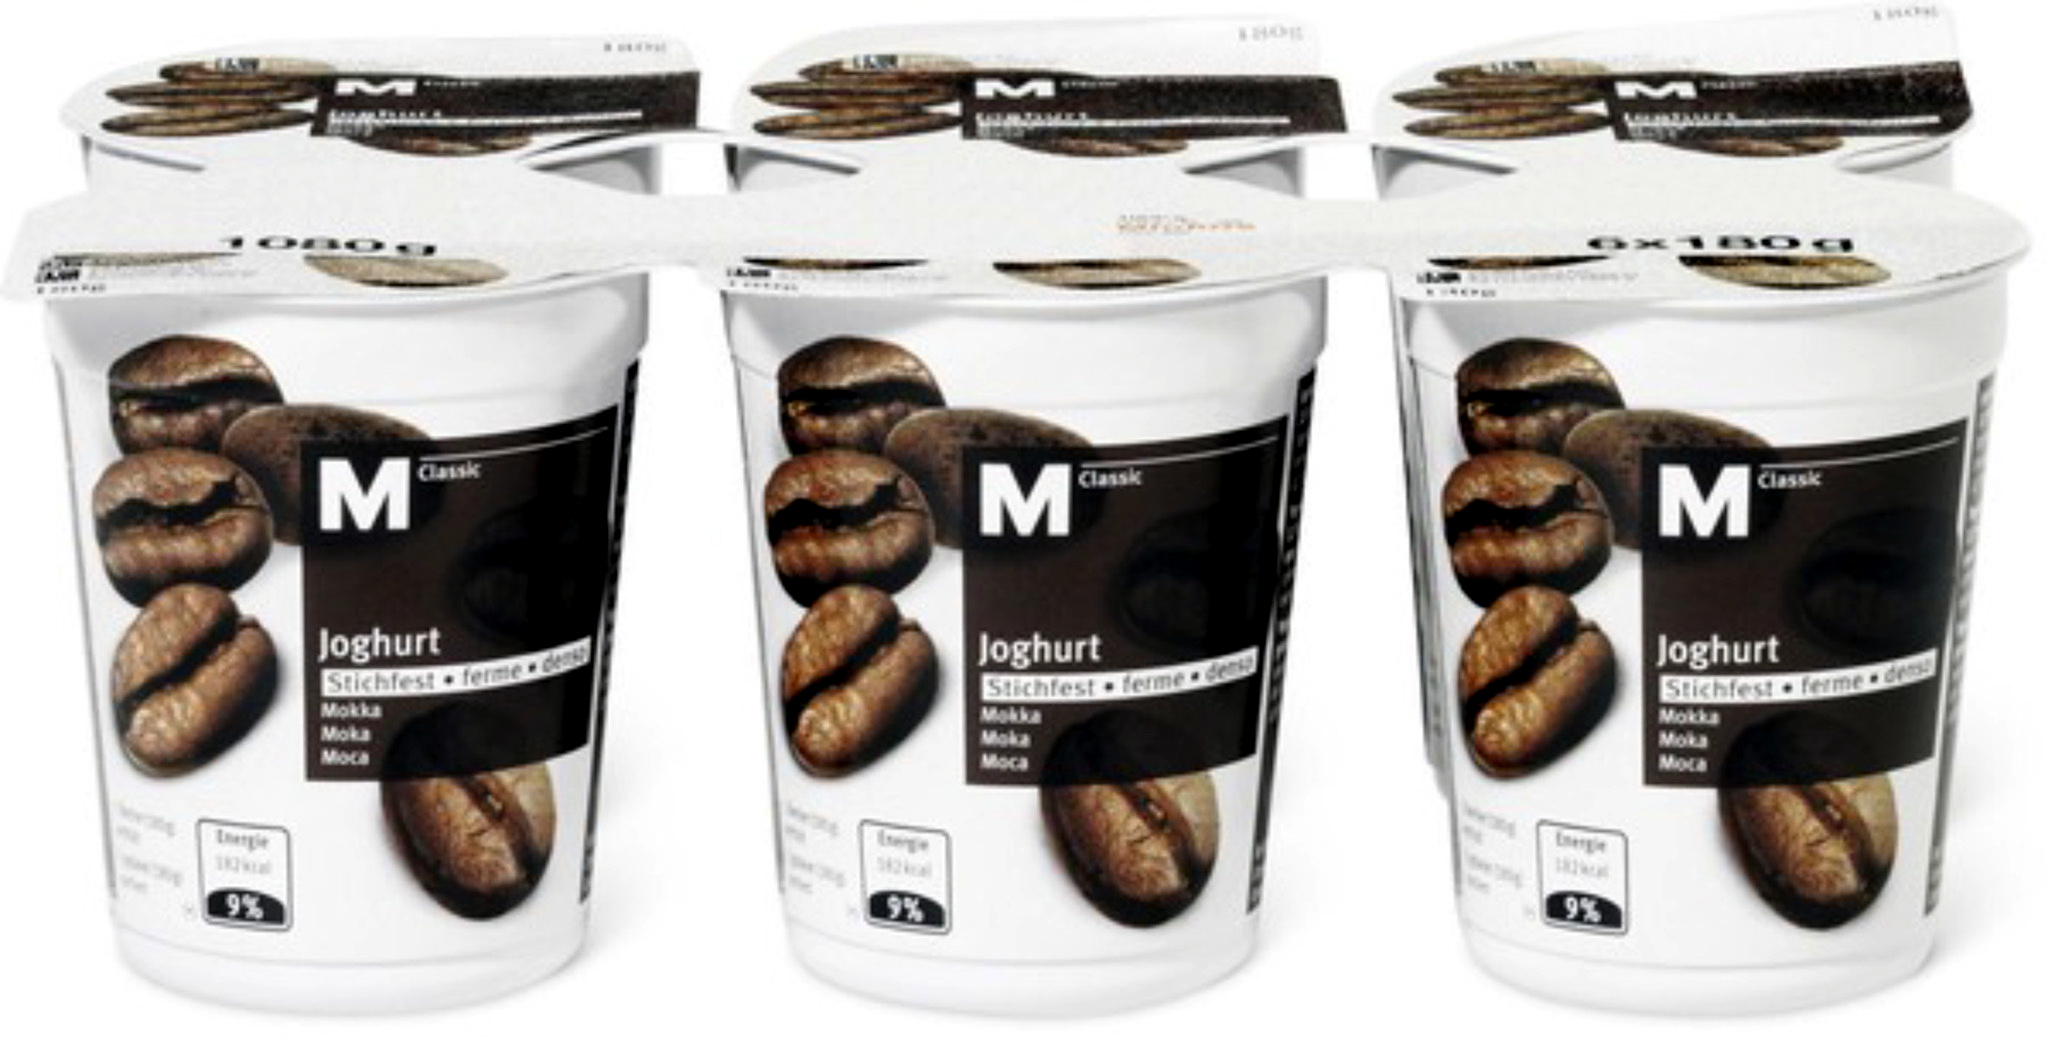 Yogourt Moka ferme M-Classic par 6 - Product - fr